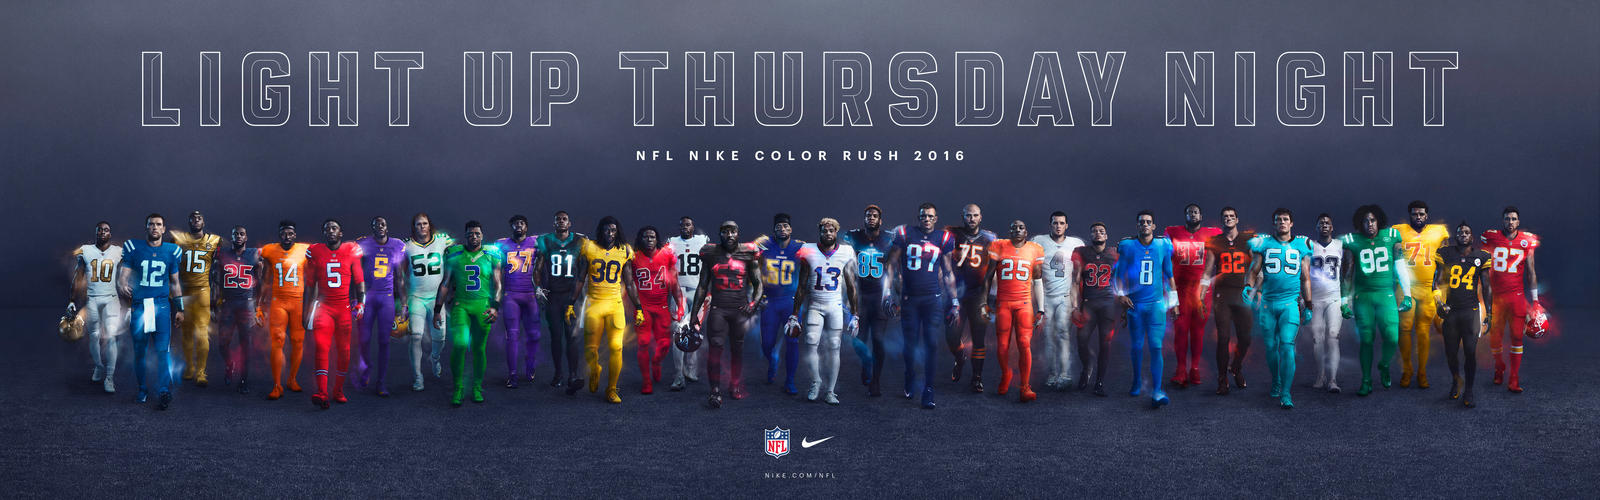 Nike Nfl Shoes Broncos